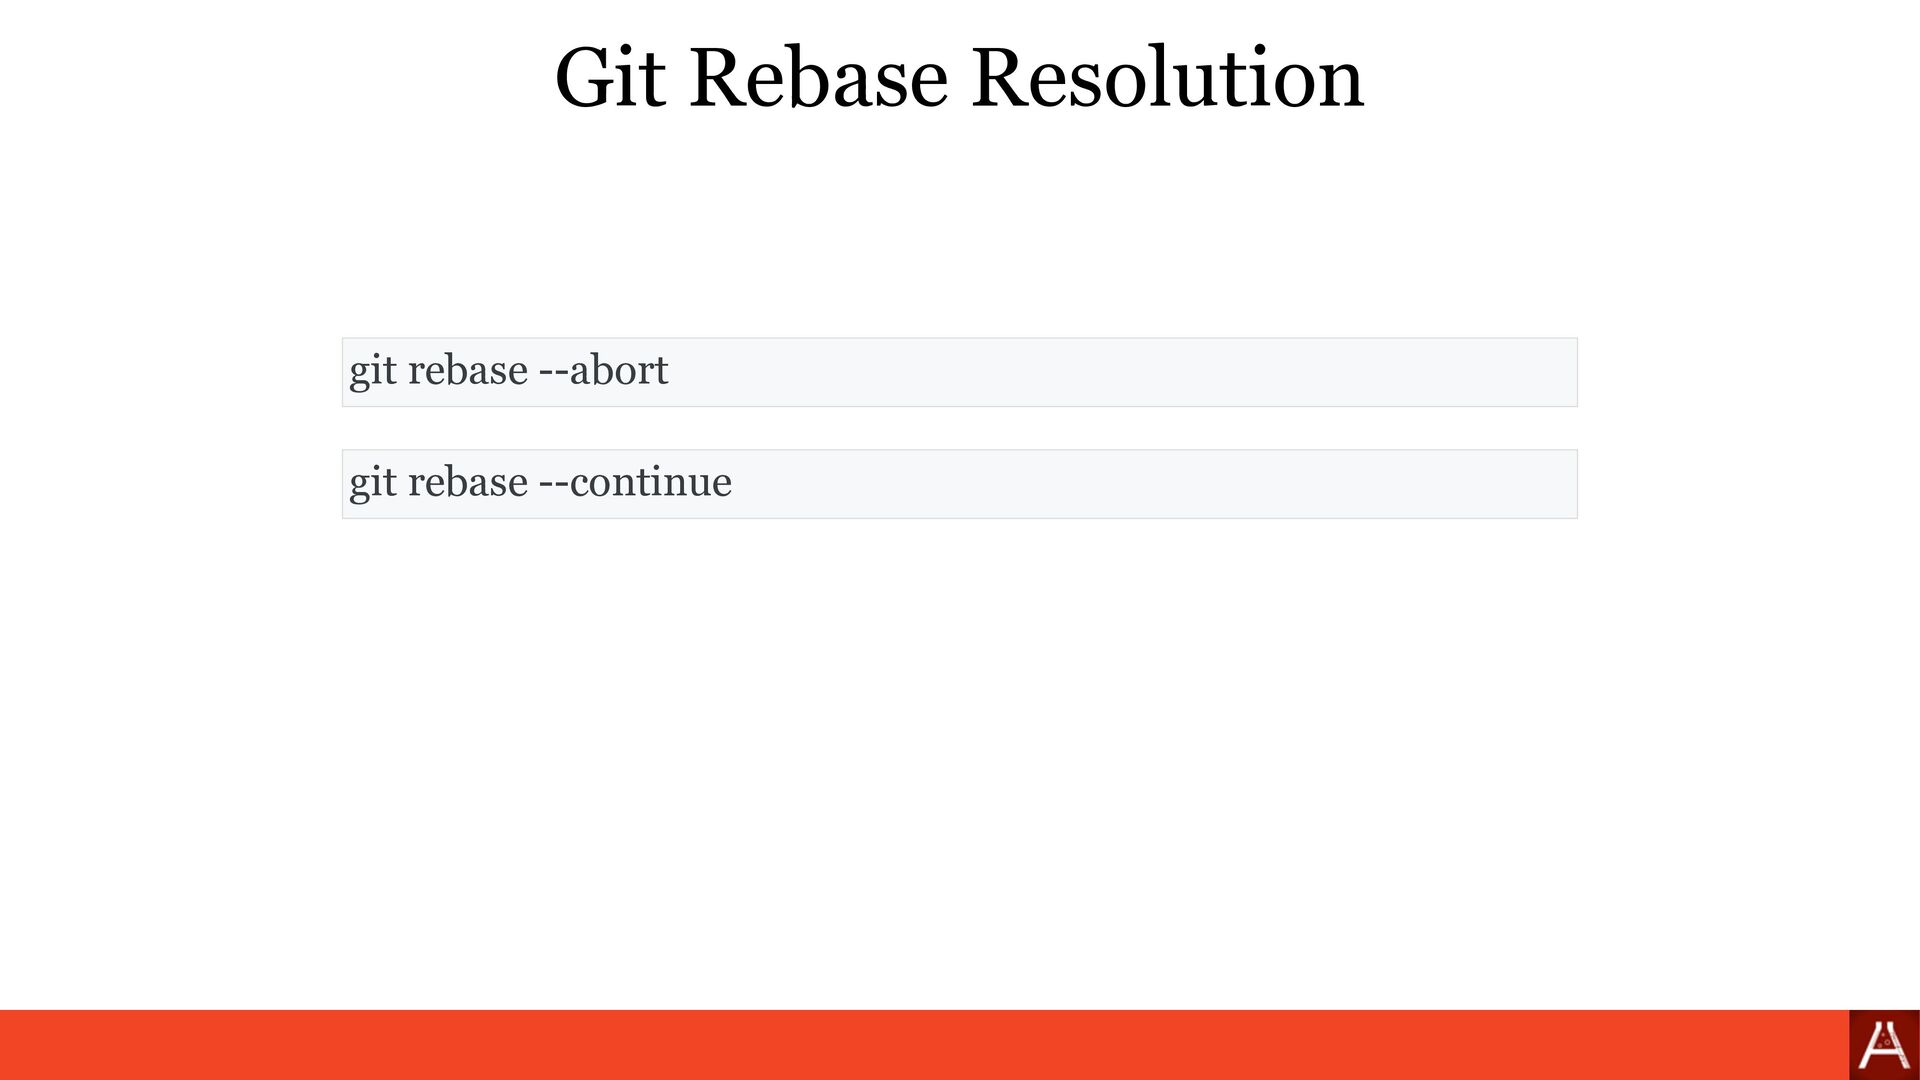 Git Commit (fixup) pick 2dc5e2e29e22 Added init...